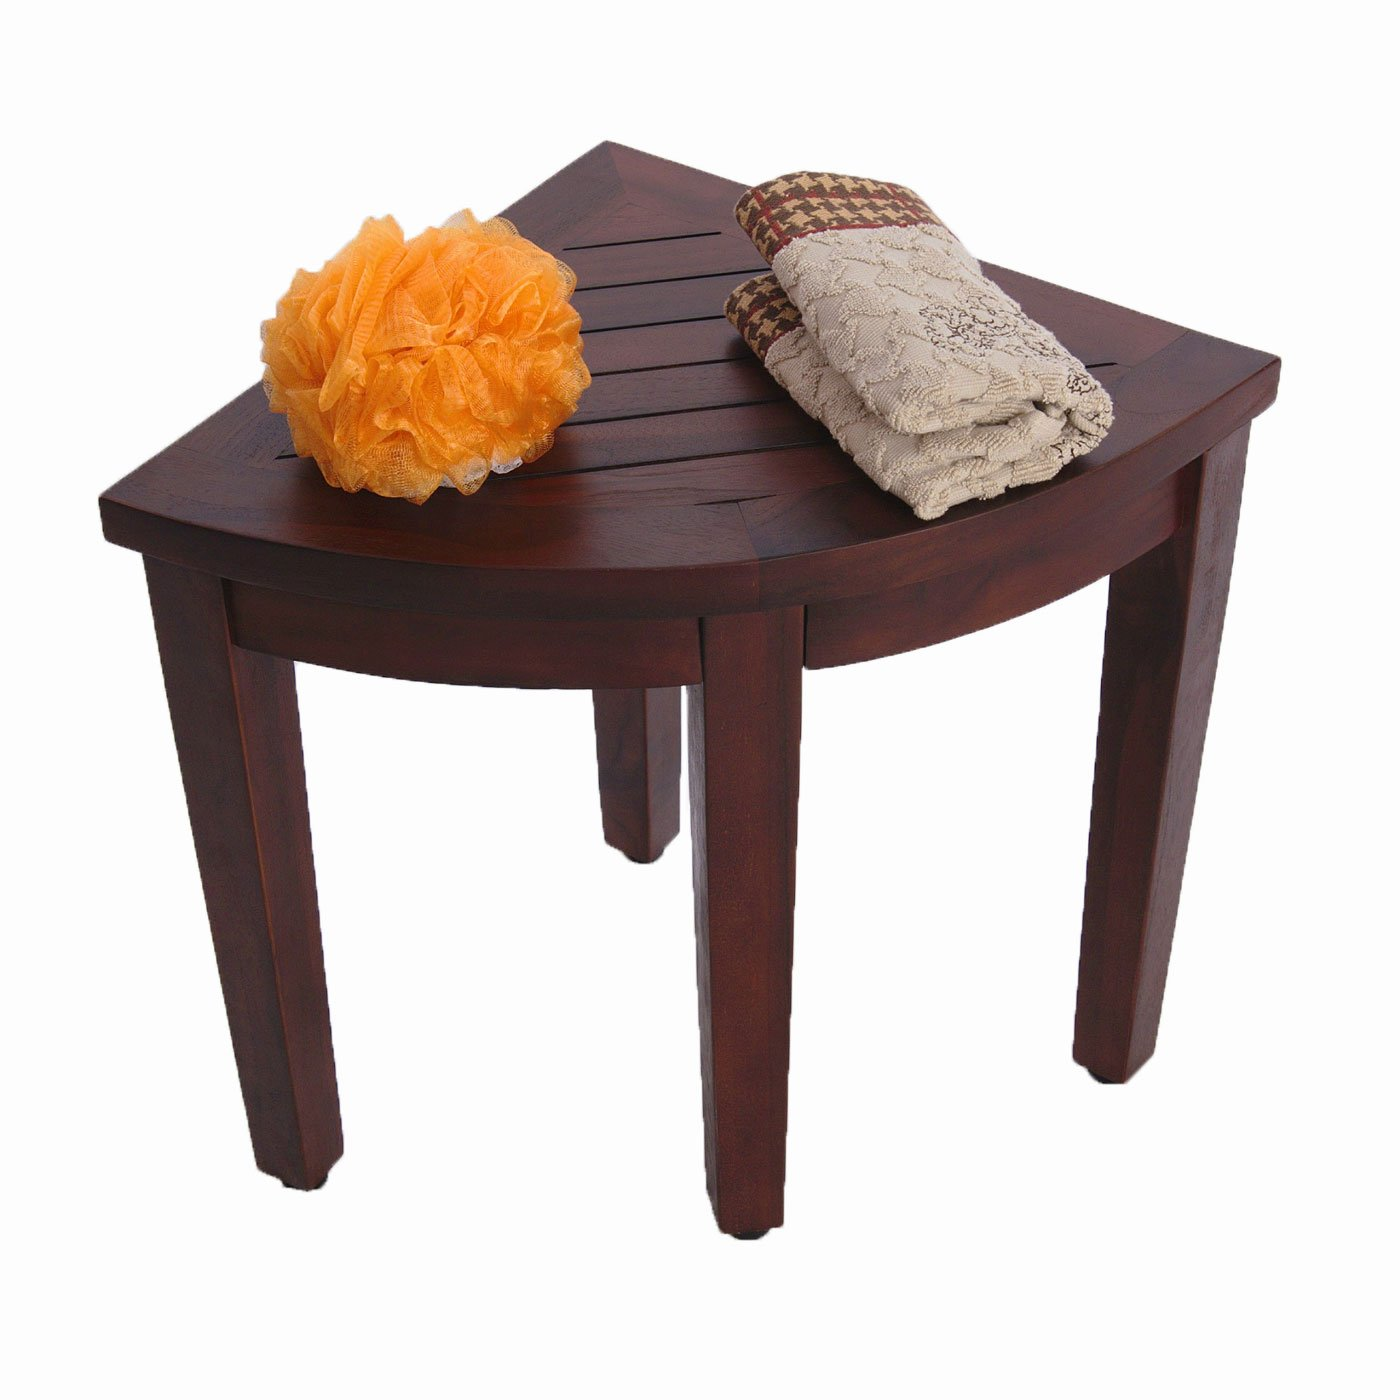 Lovely Amazon.com: Oasis Bathroom Teak Corner Shower Seat Stool Chair Bench   Sitting, Storage, Or Foot Rest: Health U0026 Personal Care